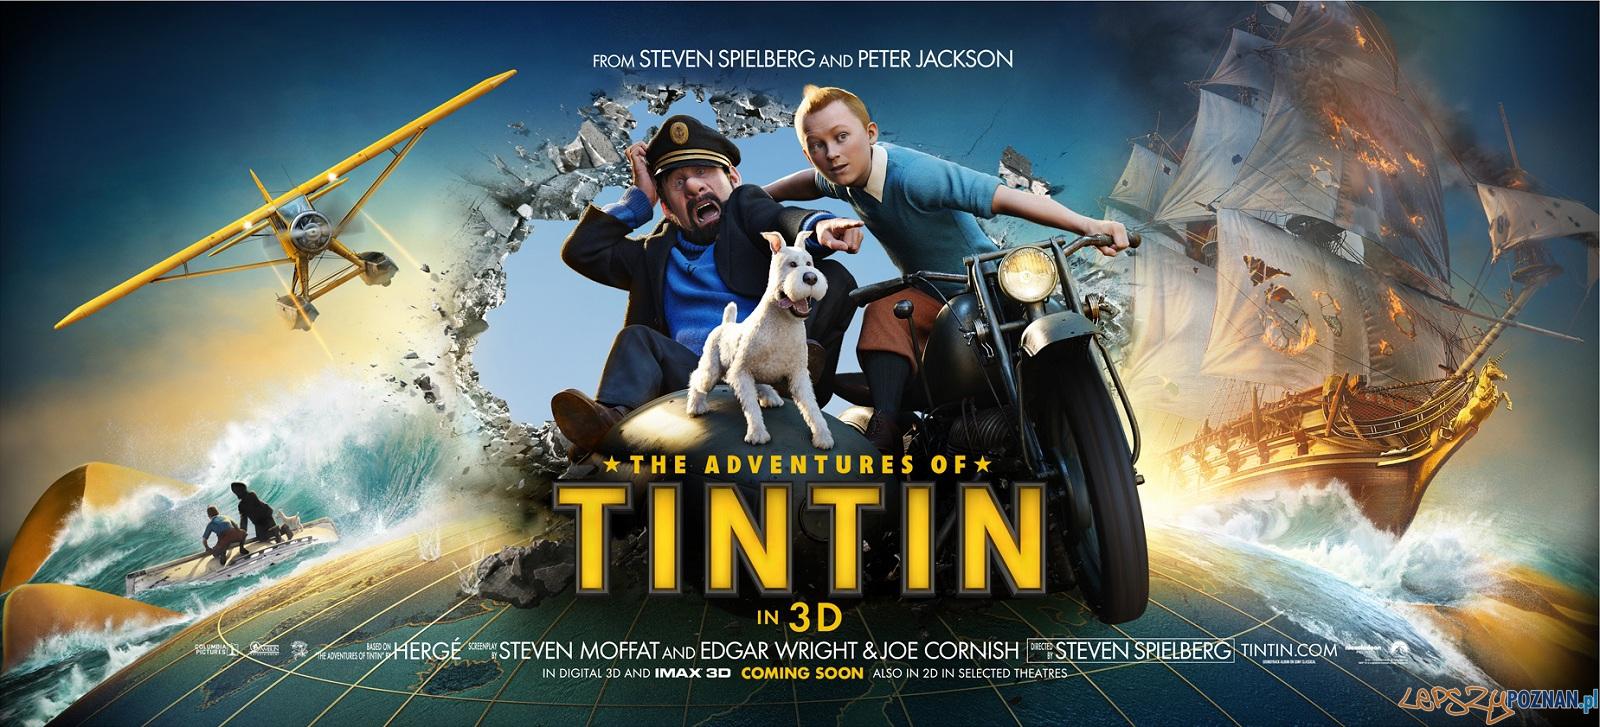 Przygody Tintina  Foto: Przygody Tintina